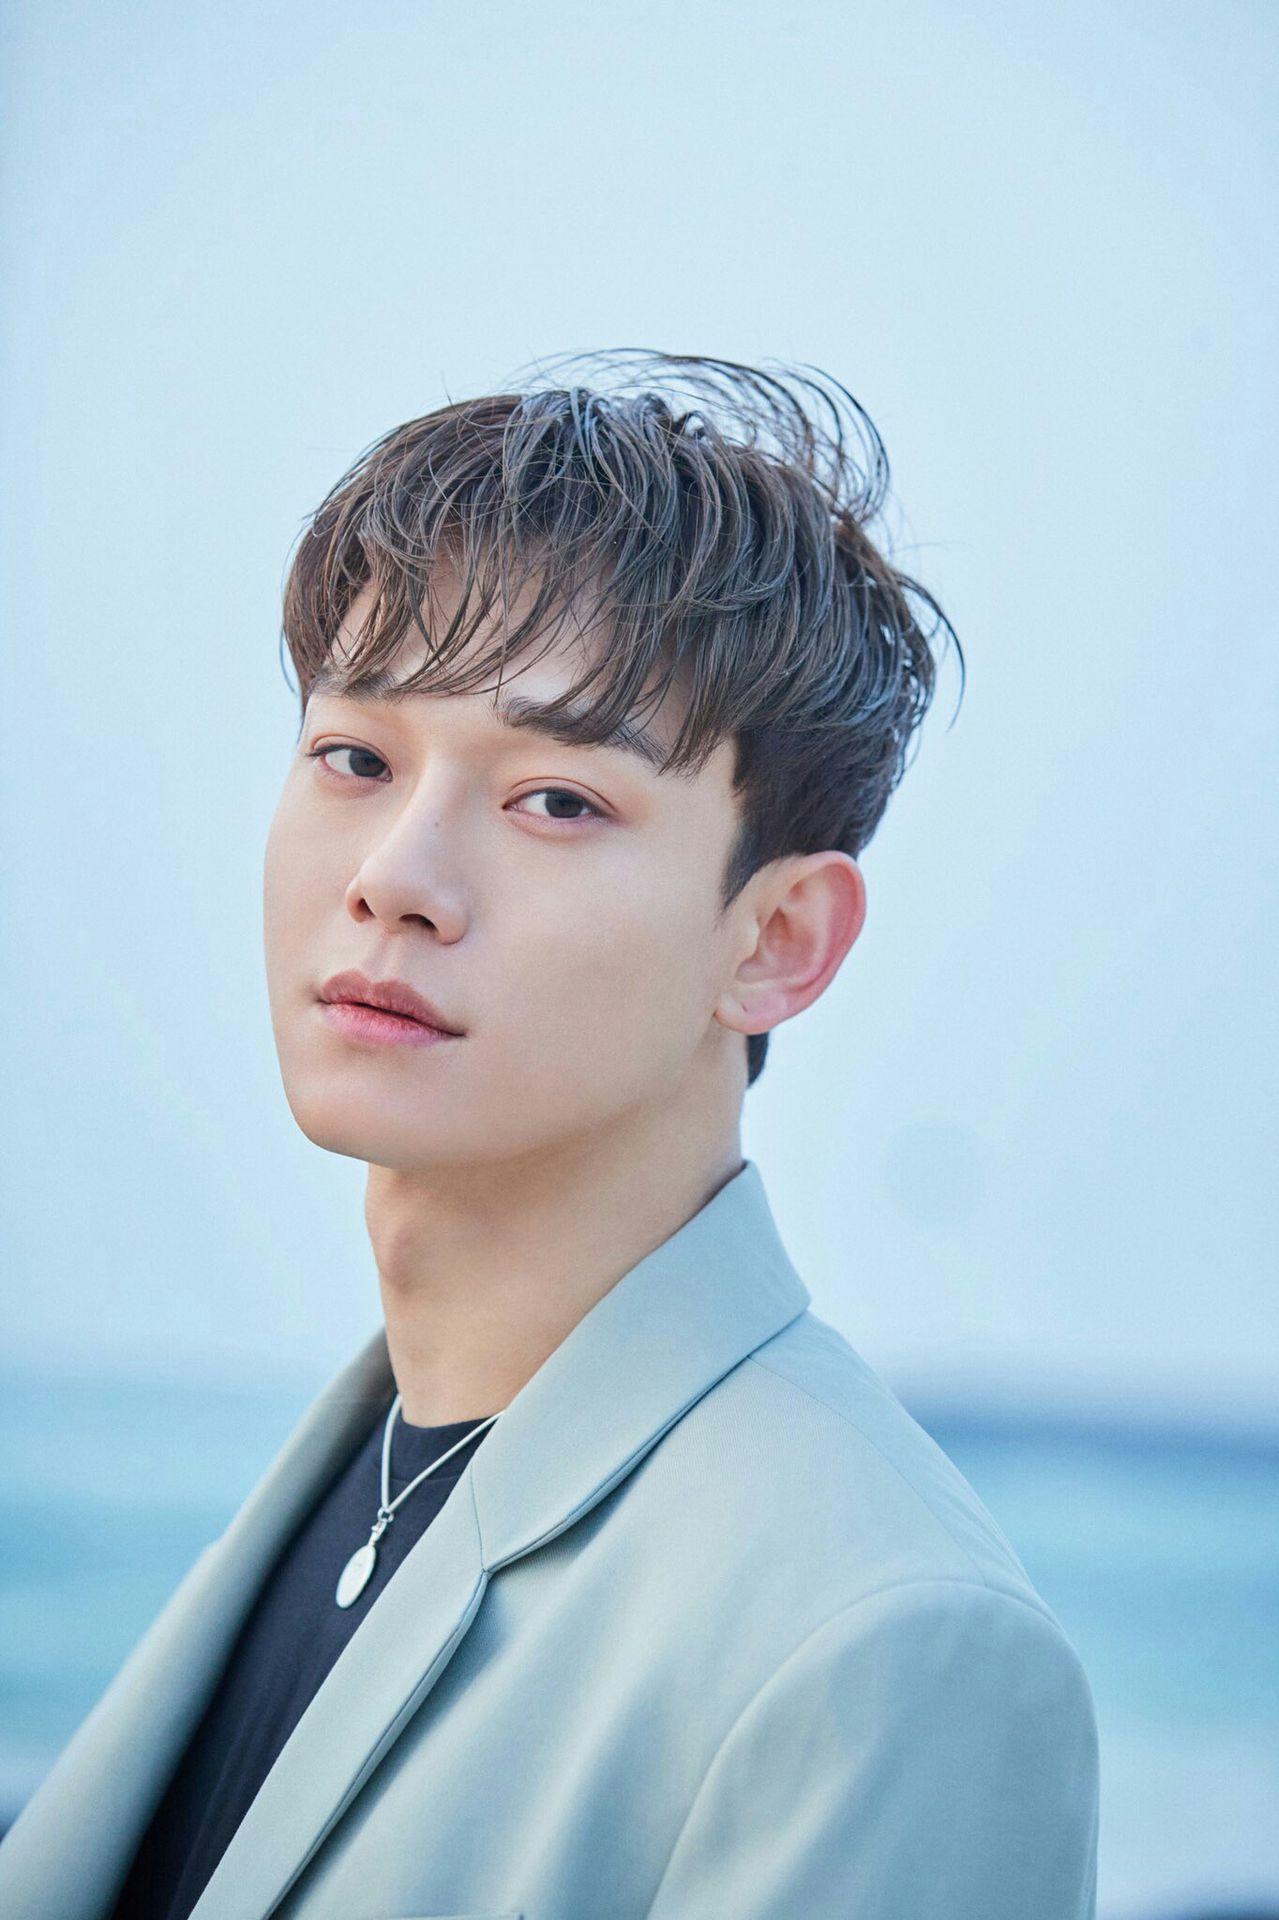 Lirik Lagu EXO #2 - April, and a flower [Teaser] - Wattpad